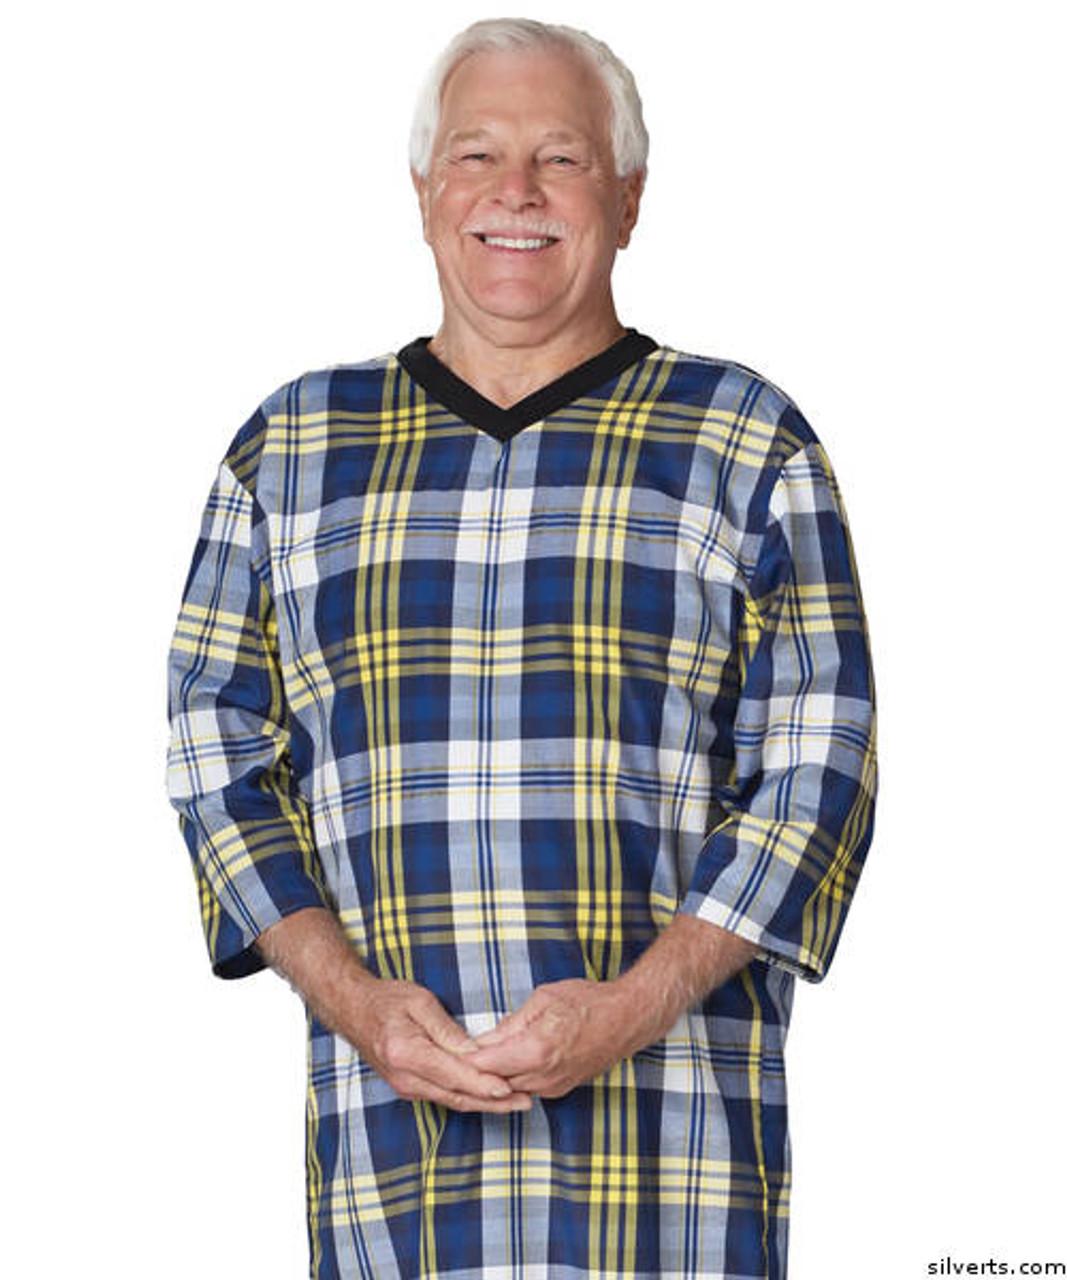 e809477c47 Silvert s 500500505 Mens Adaptive Cotton Hospital Patient Nightgowns